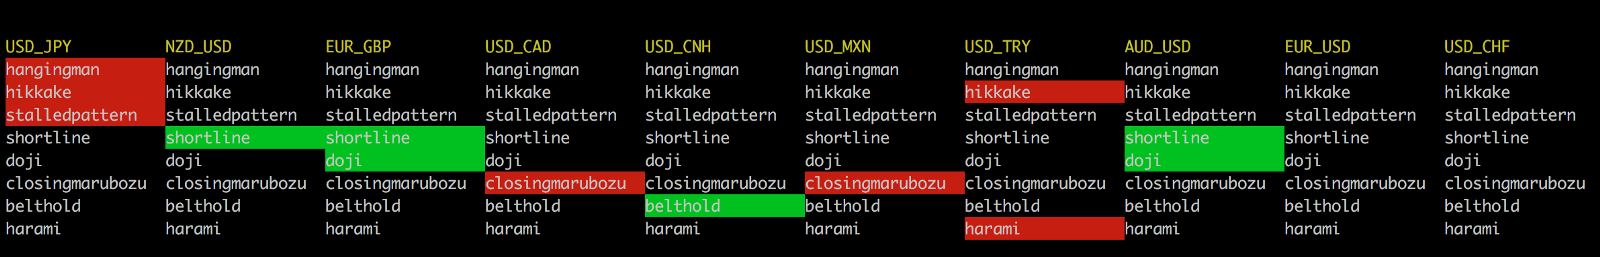 How to Write a Runescape Auto Clicker with Python, Part I